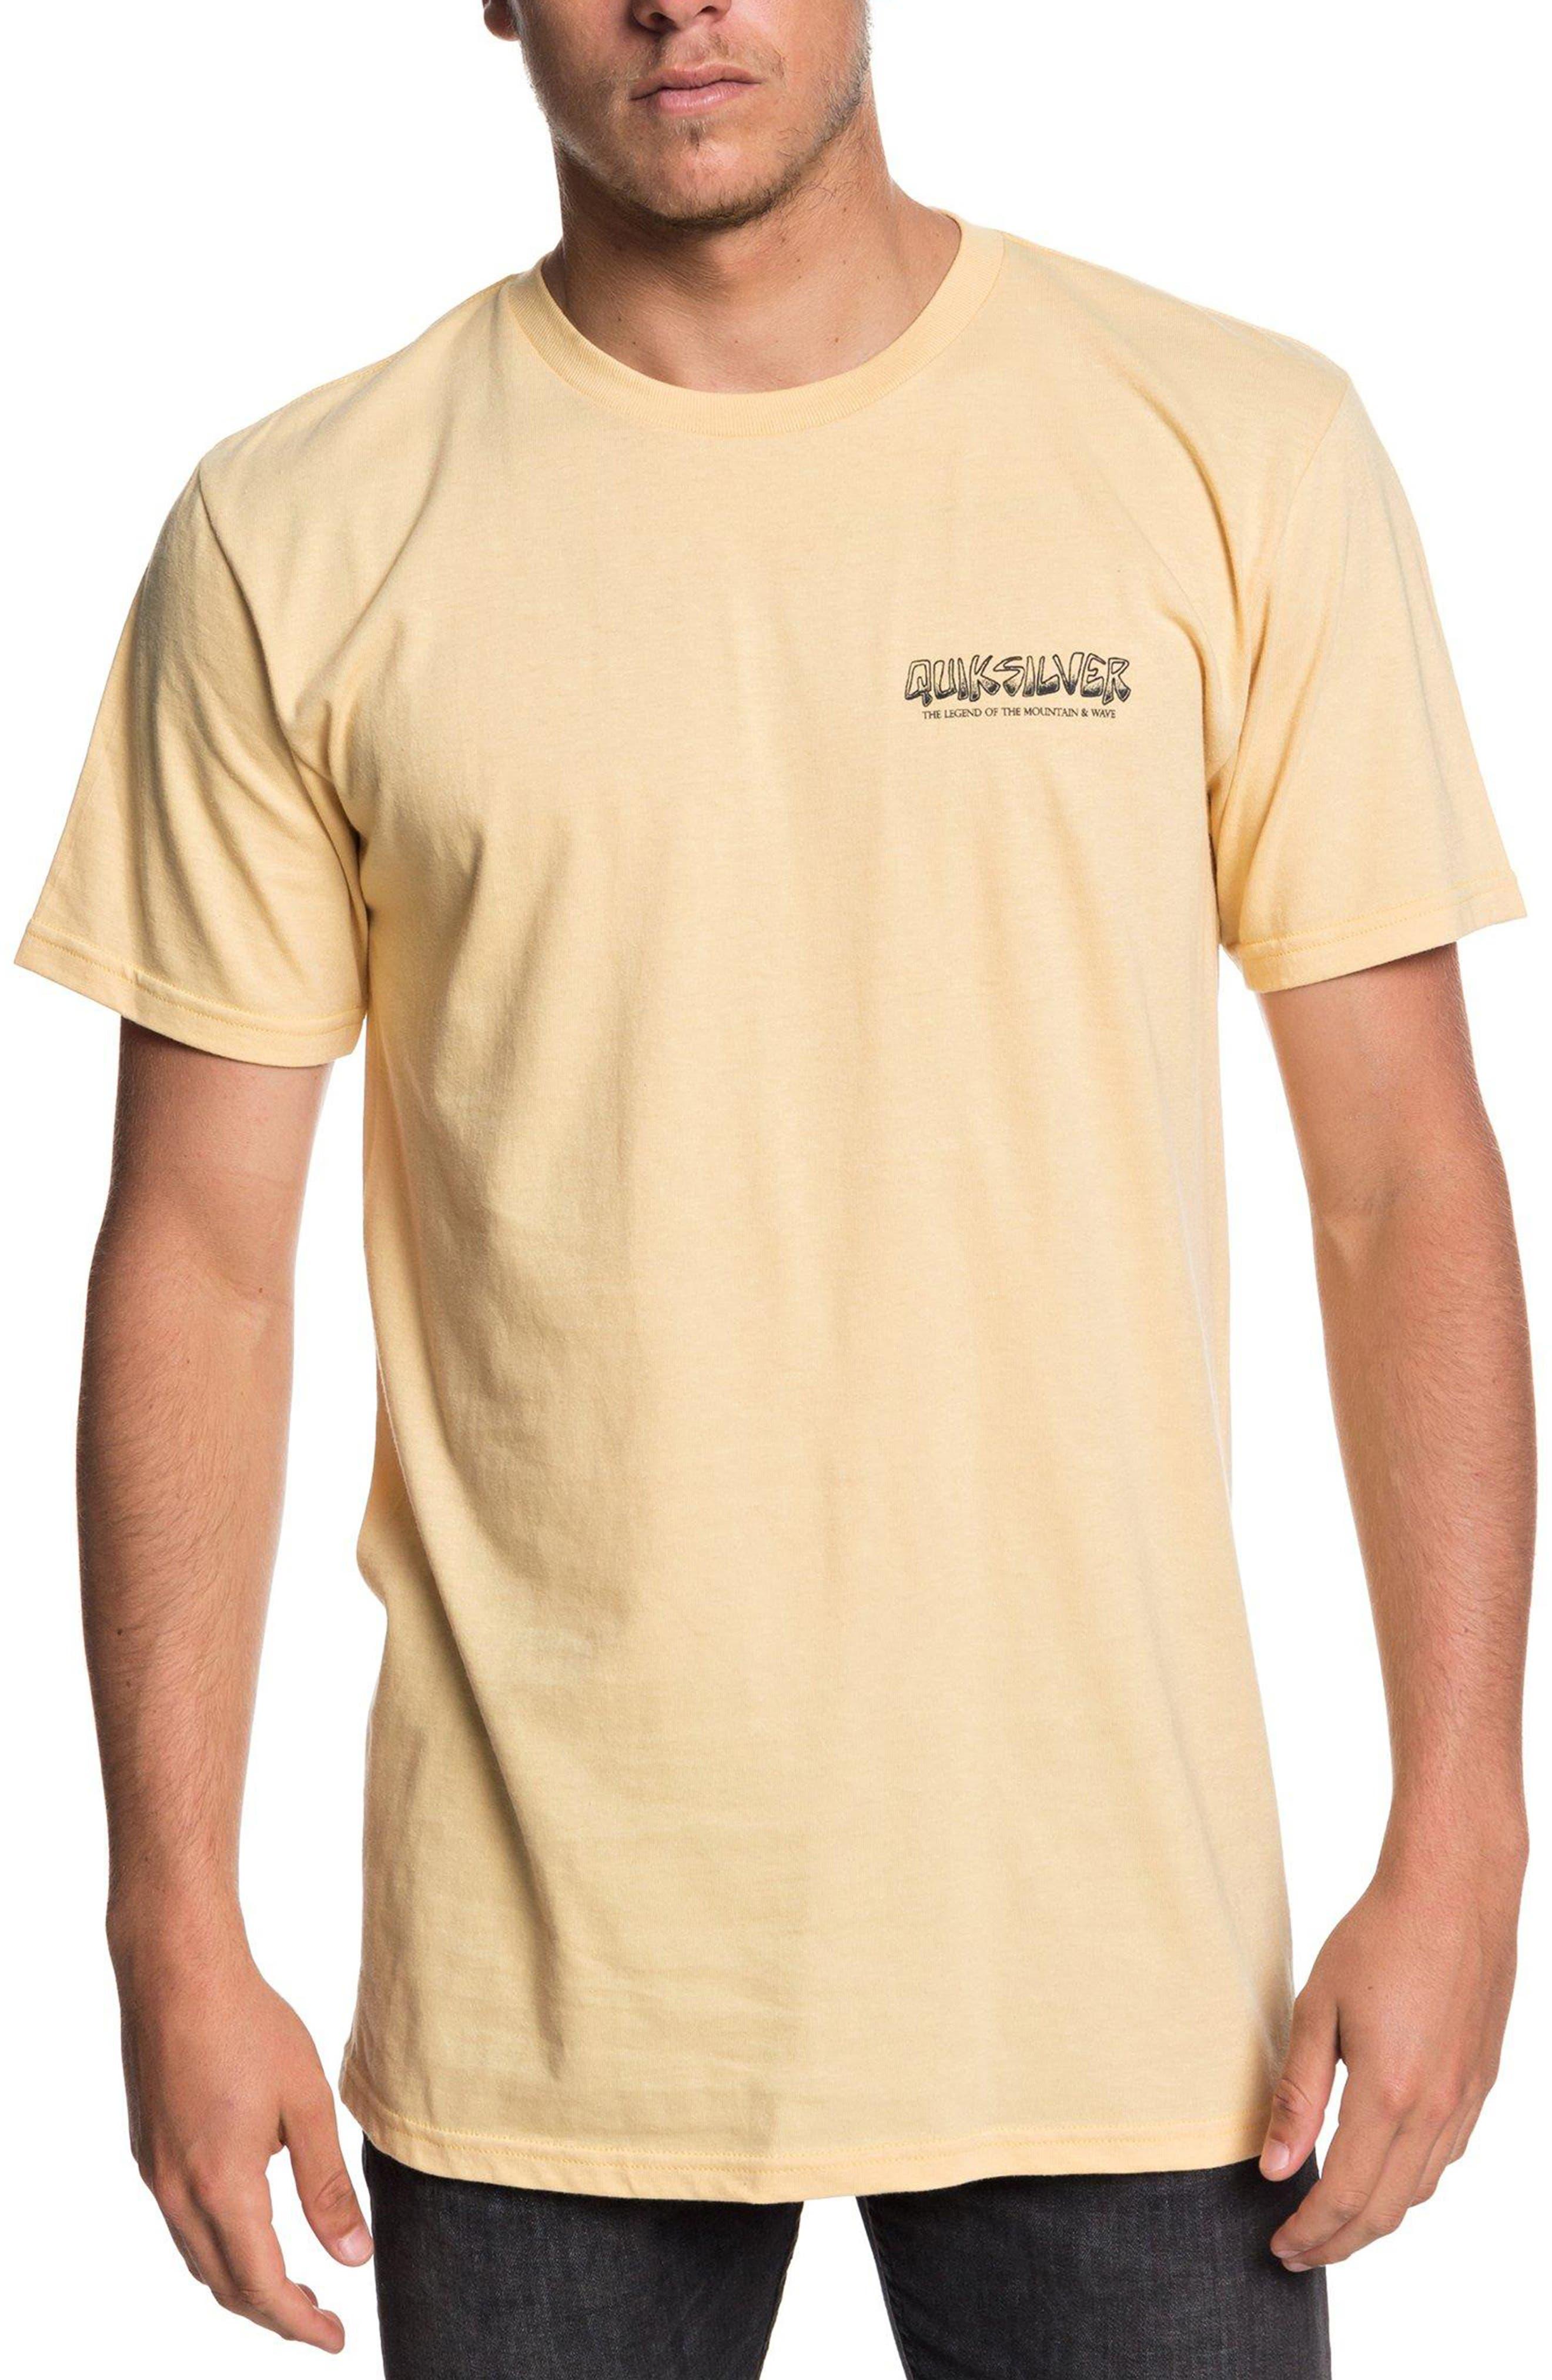 QUIKSILVER Og Mountain & Wave Graphic T-Shirt in Sahara Sun